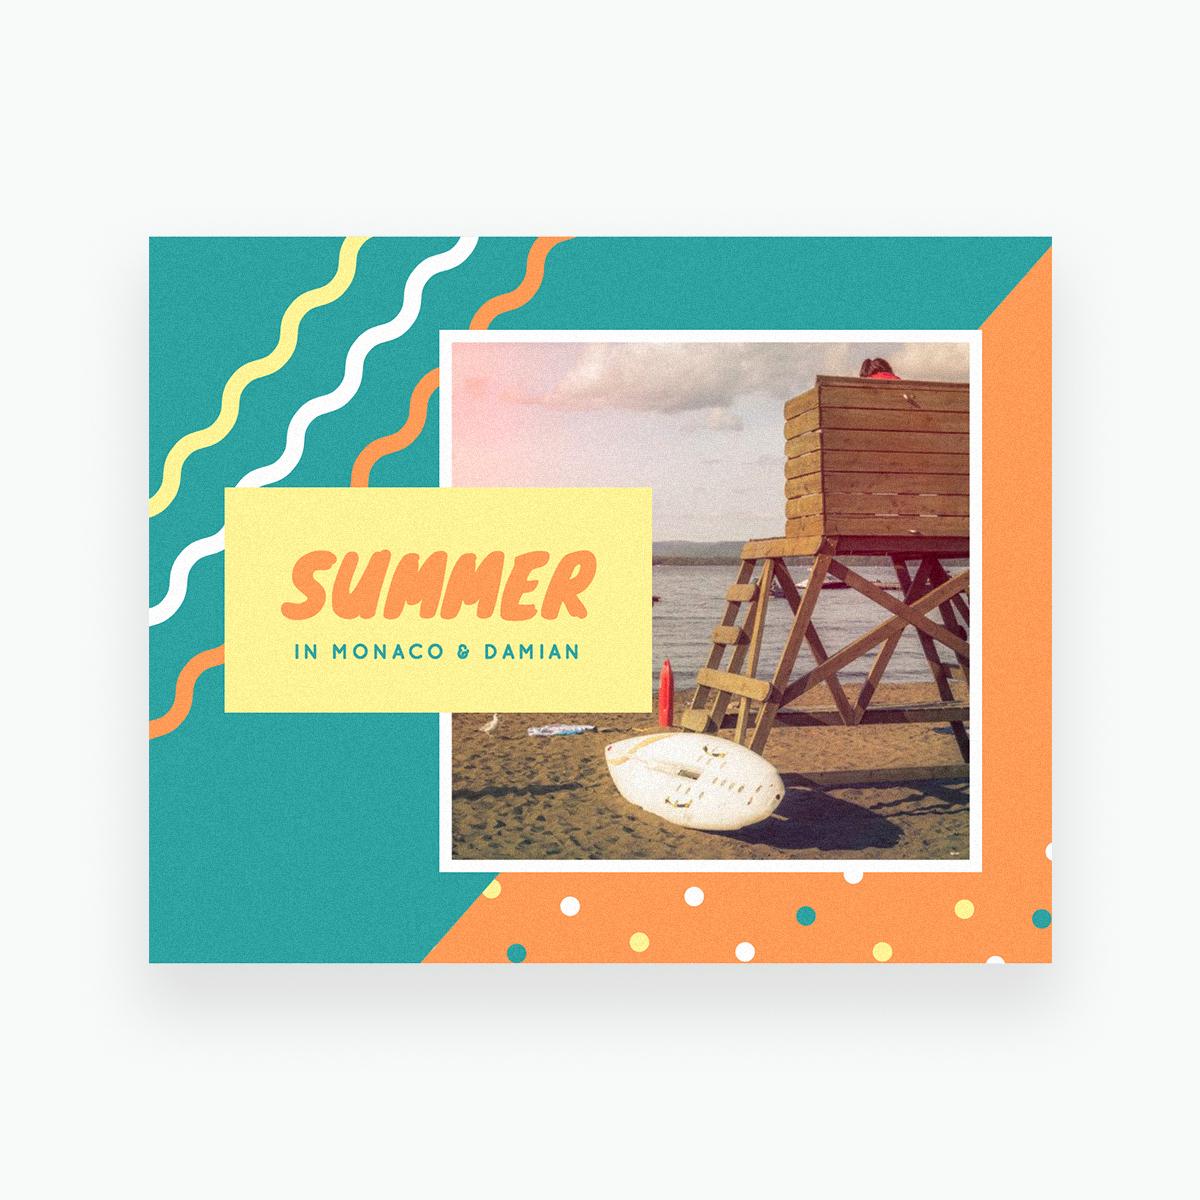 Free Online Scrapbook Maker: Create Custom Designs Online | Canva - Free Online Digital Scrapbooking Printable